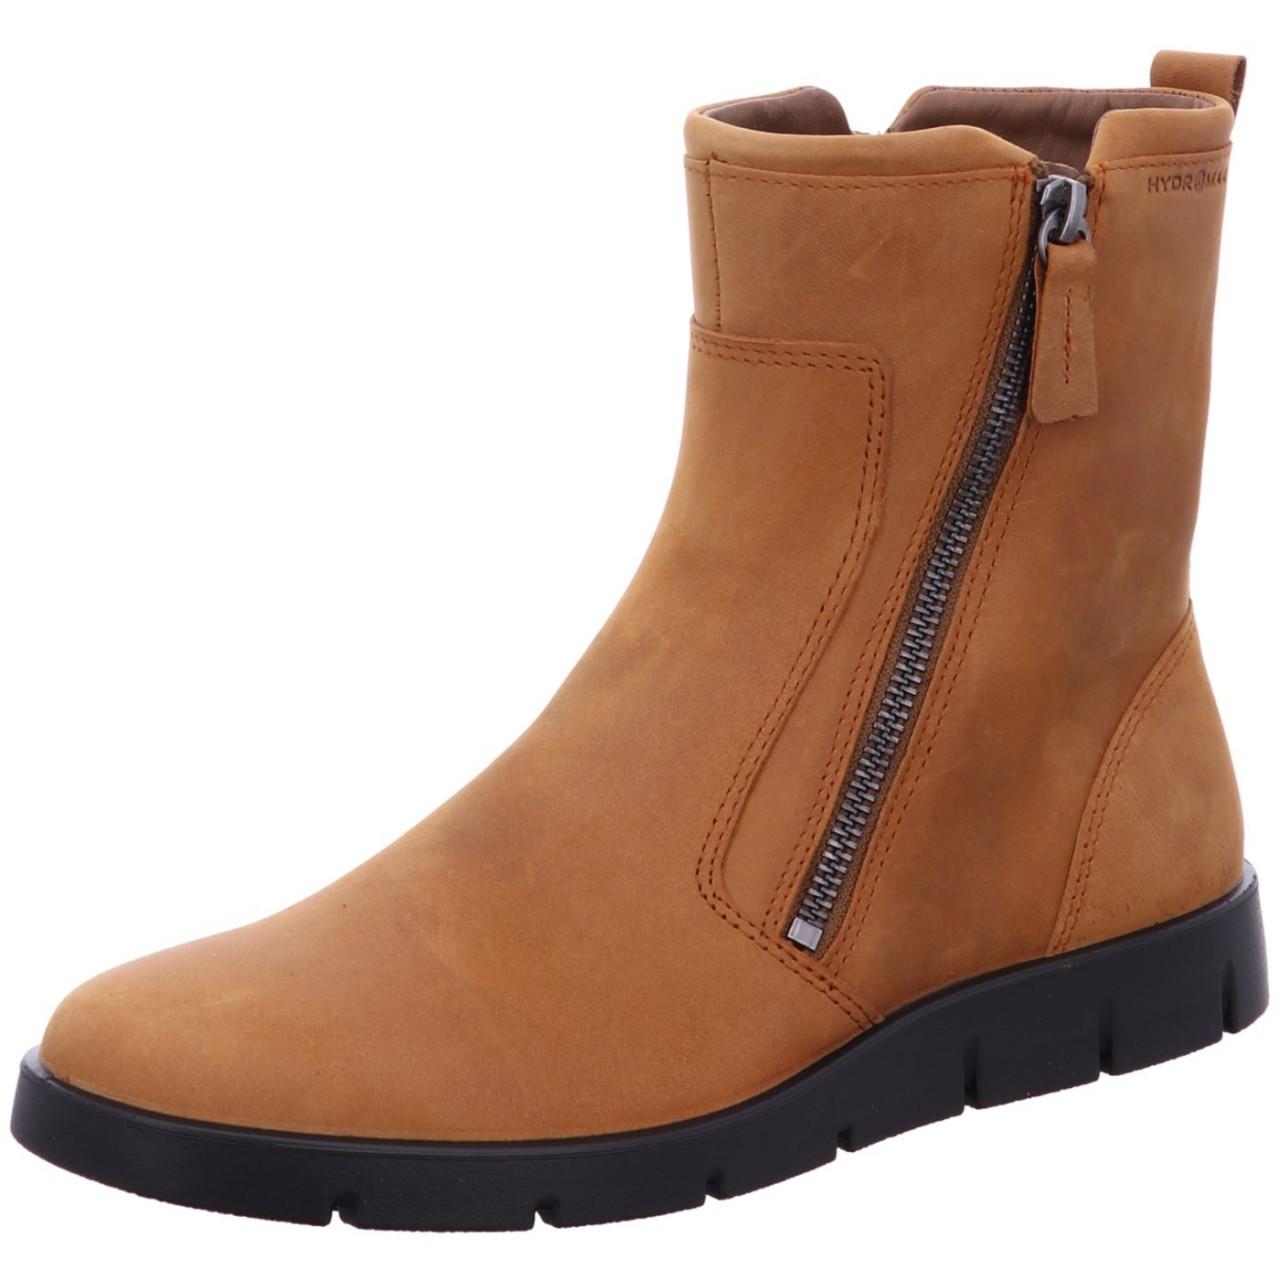 Ecco Boot Bella Braun AMBER/AMBER 57624 282263-57624